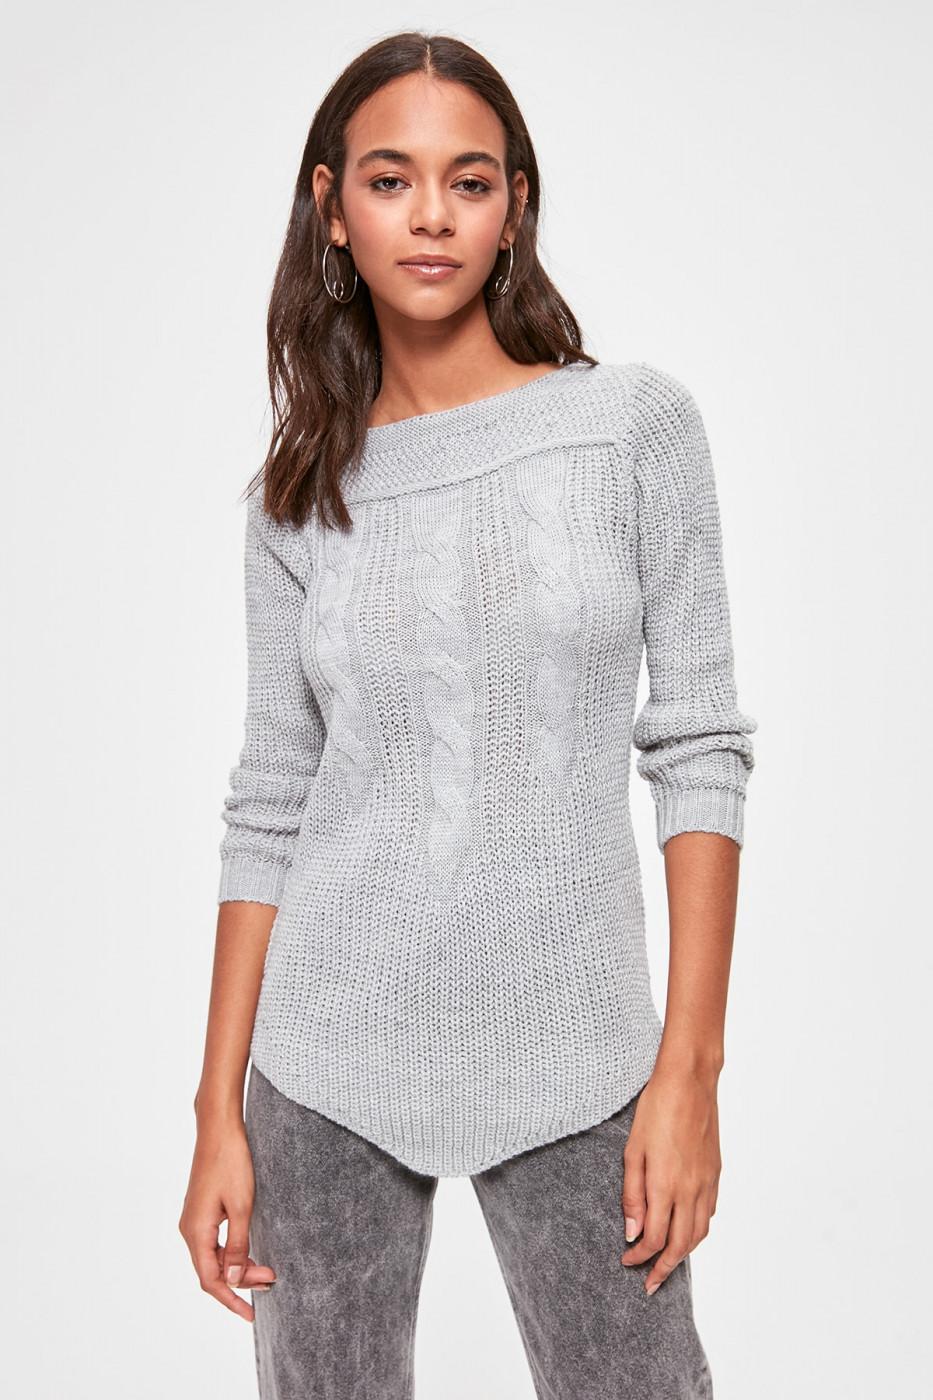 Trendyol Grey Hair Braided Knitwear Sweater